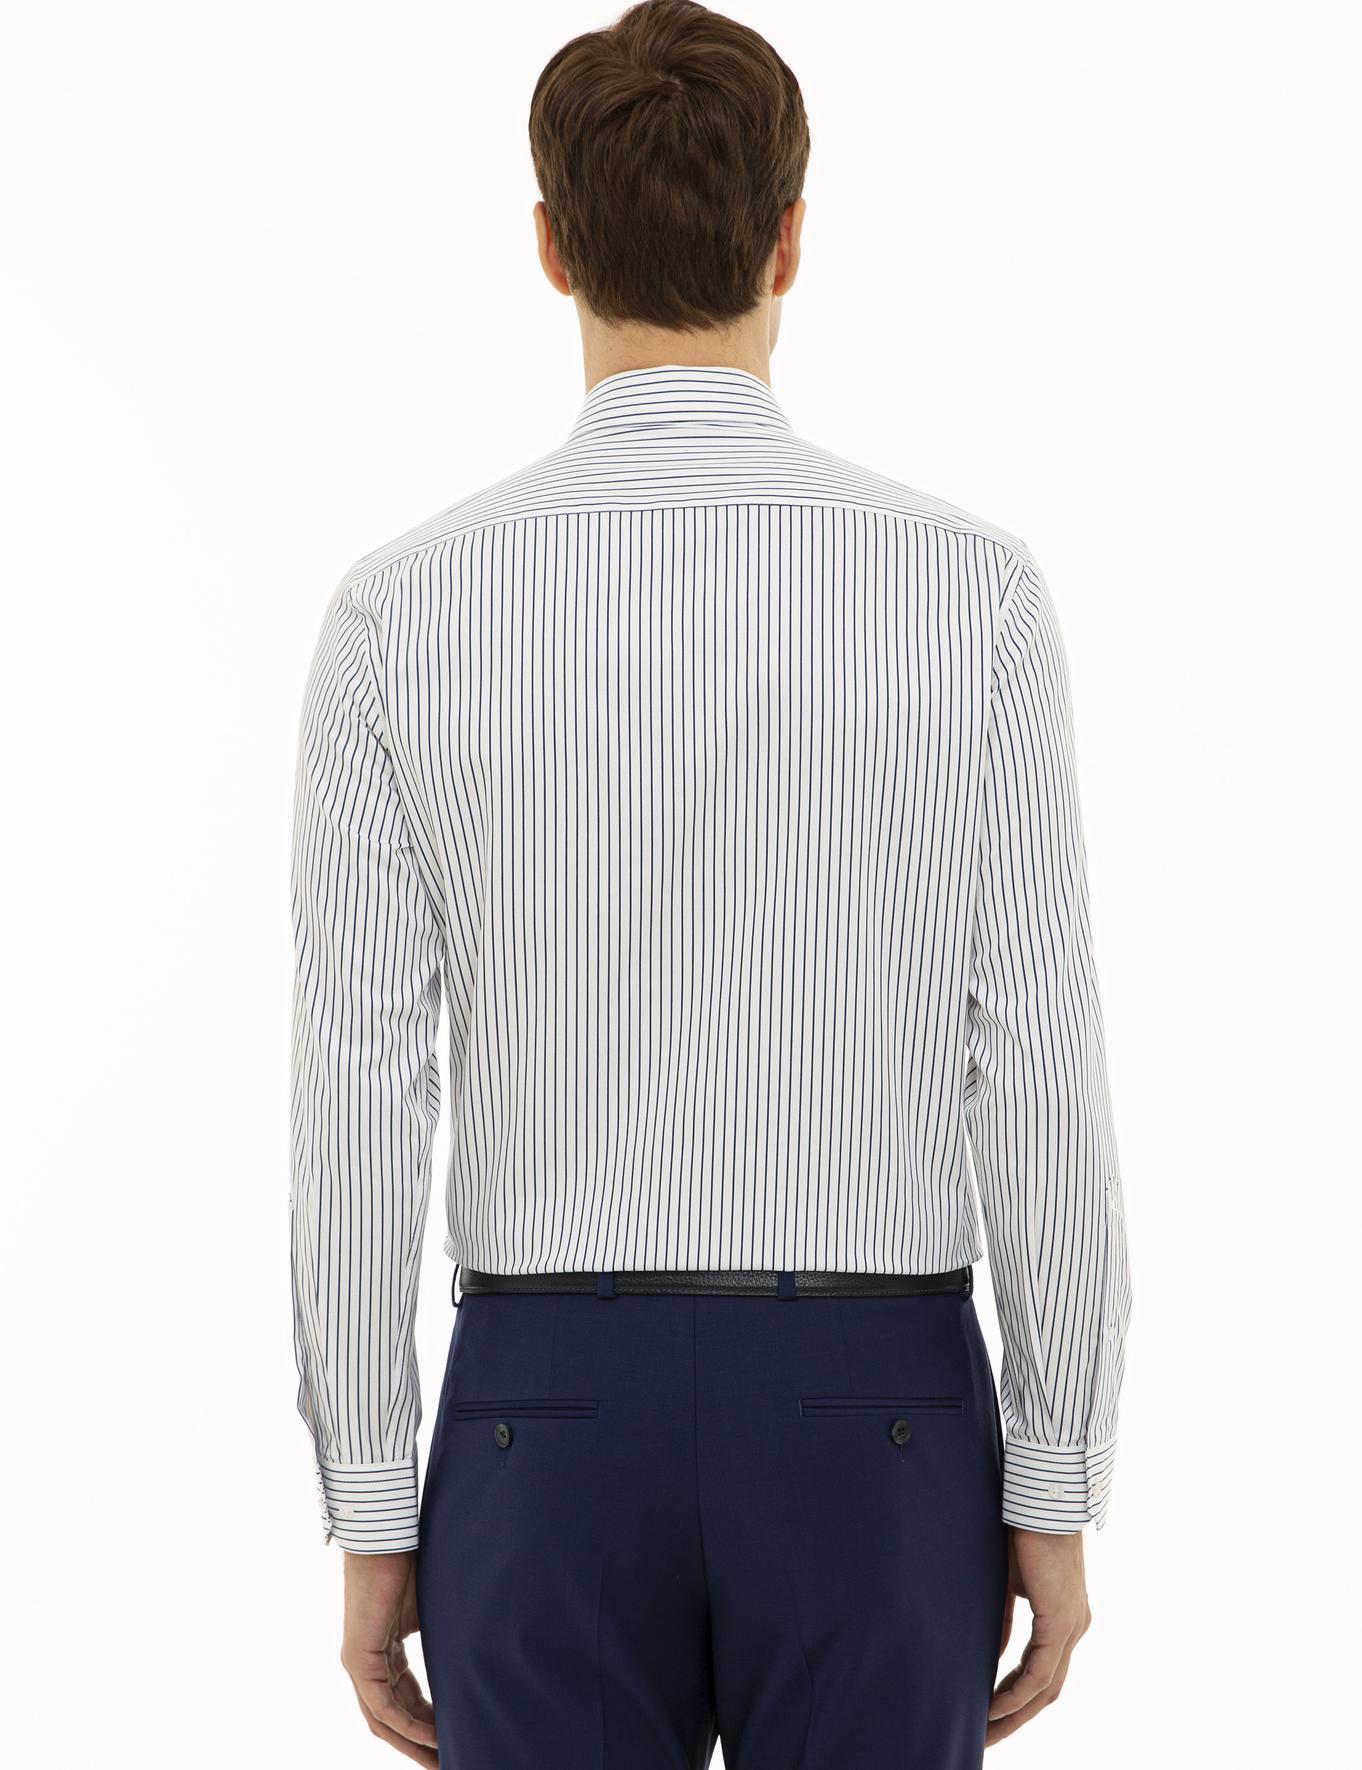 Beyaz Slim Fit Gömlek - 50229808024